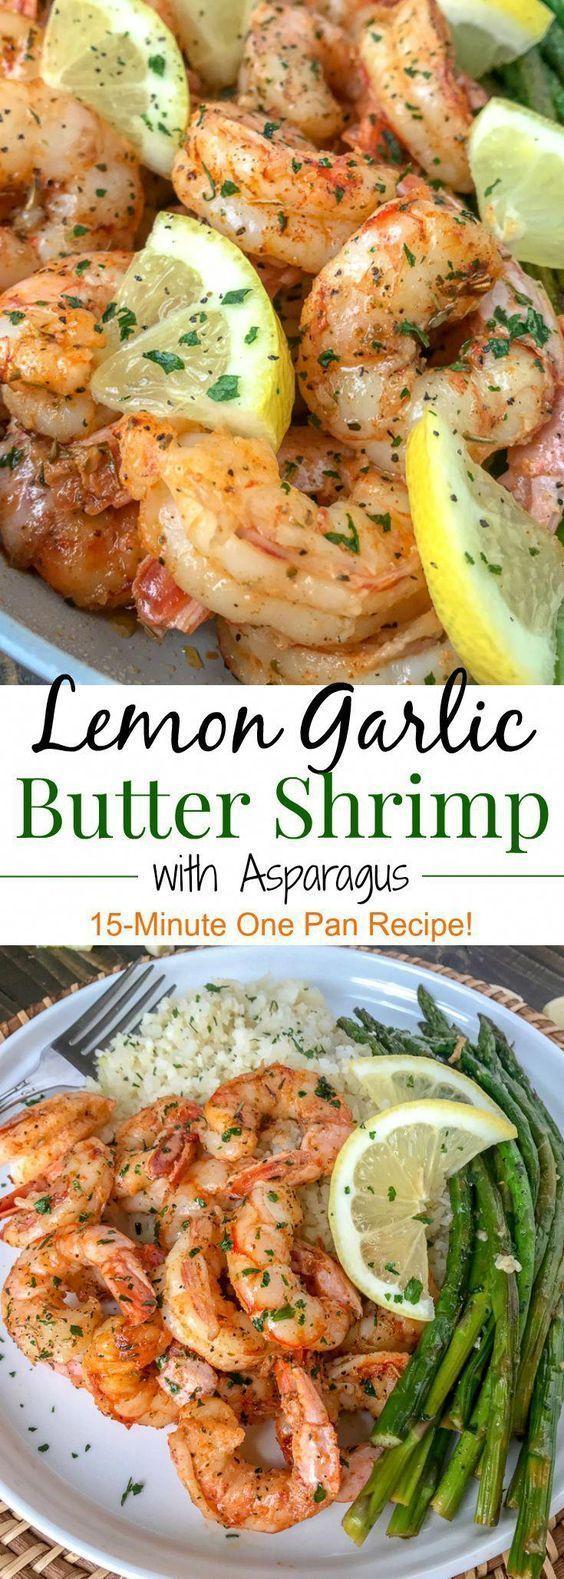 Lemon Garlic Butter Shrimp with Asparagus - -